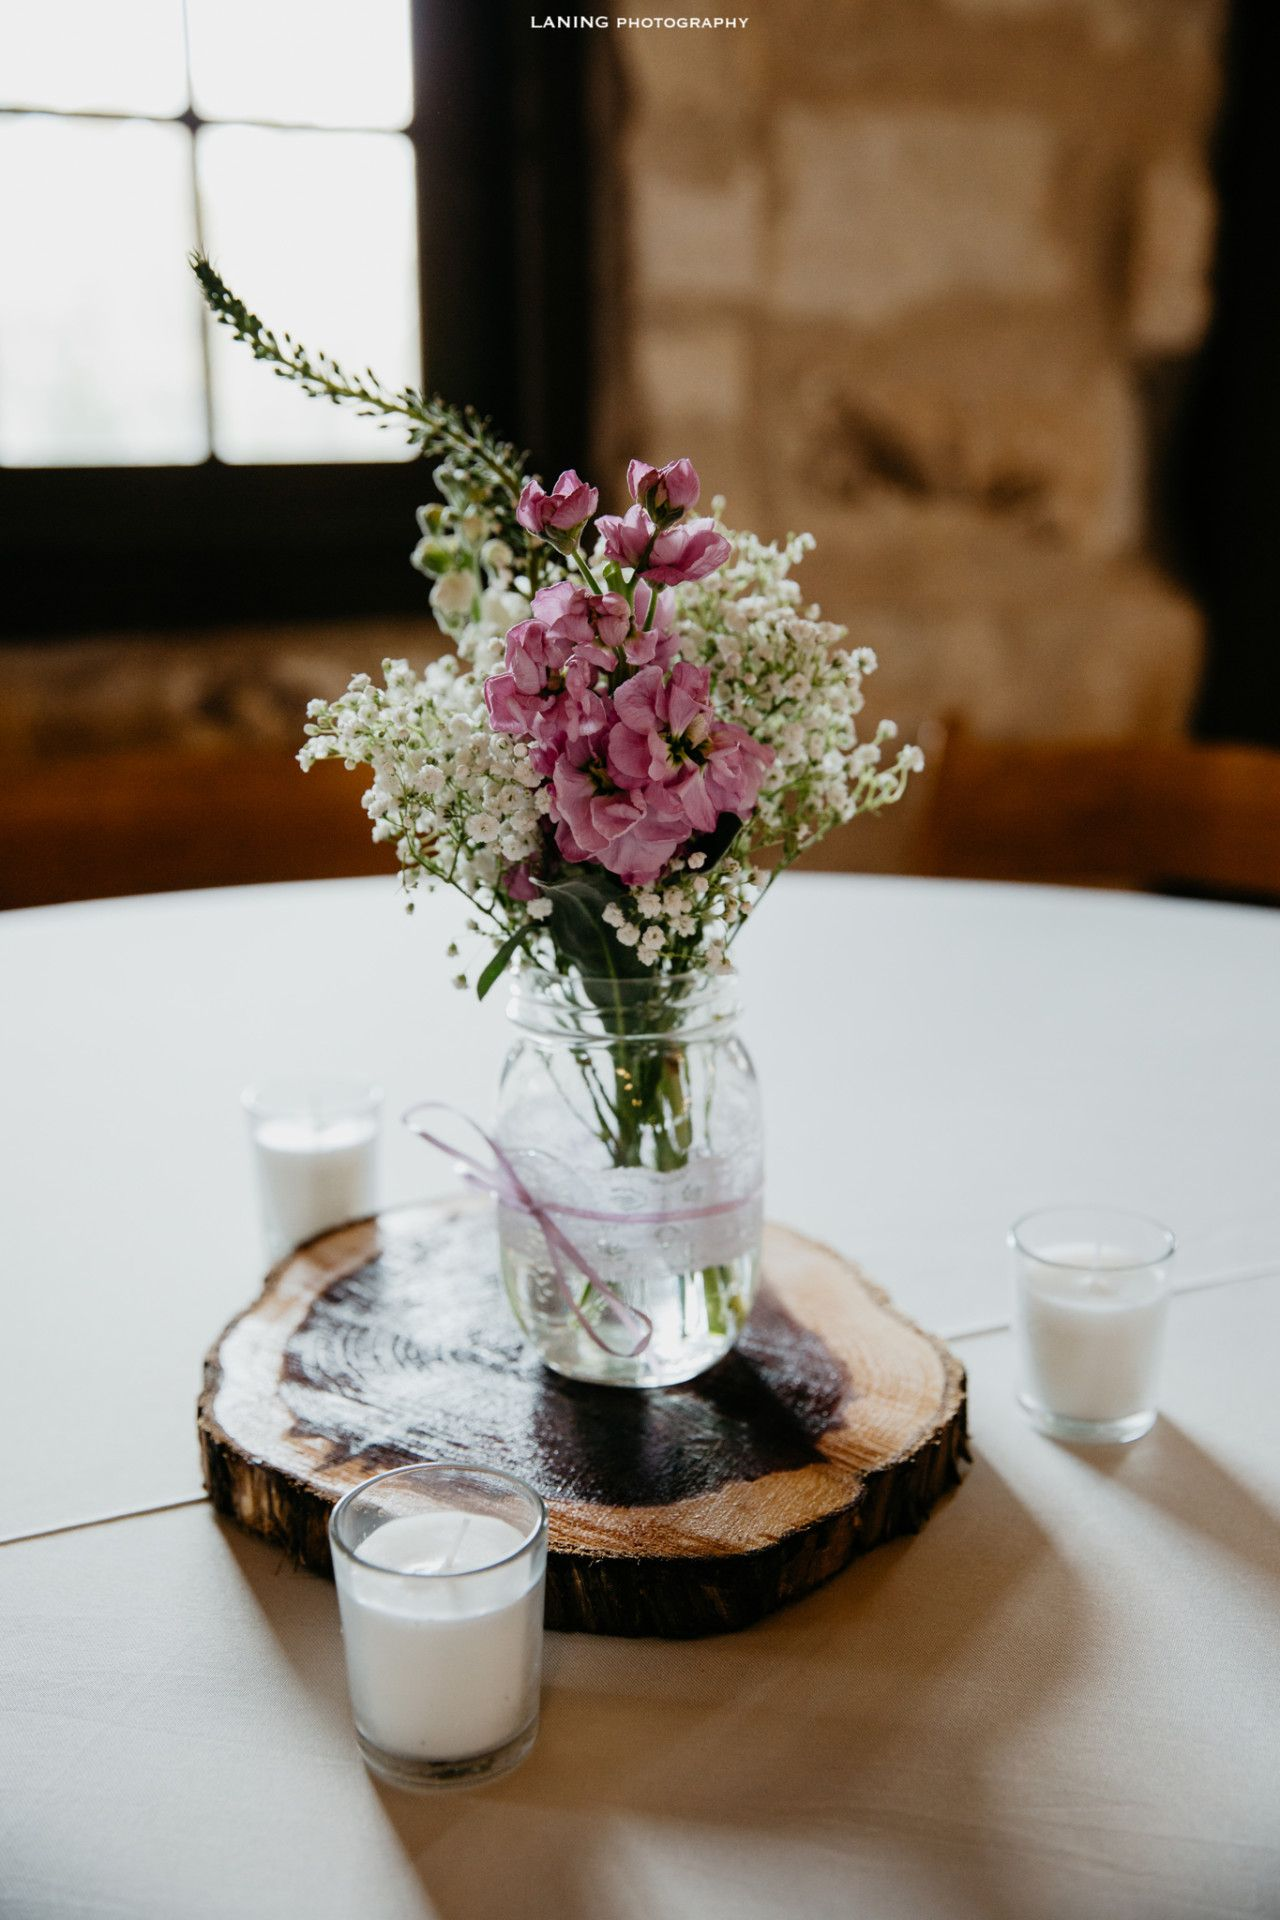 Midwest Arboretum Wedding - Rustic Wedding Chic  |Diy Rustic Wedding Table Centerpieces